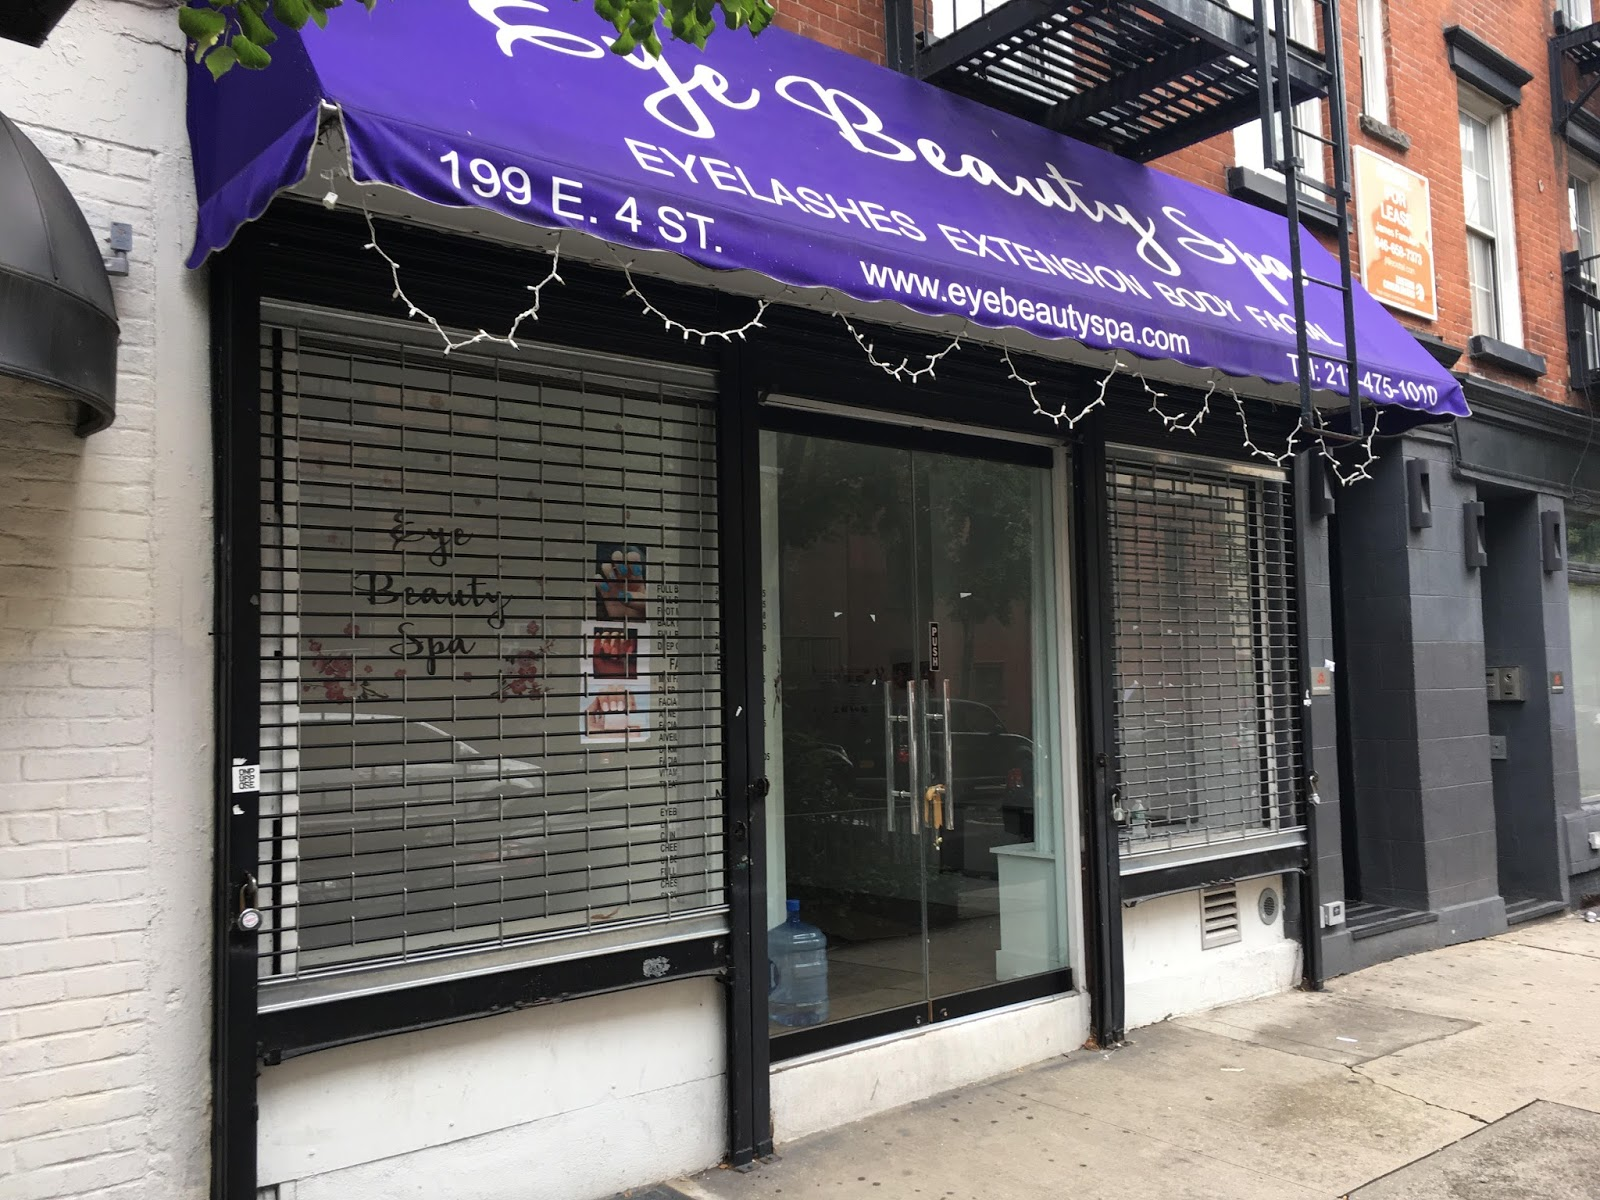 EV Grieve: Former Eye Beauty Spa for rent on 4th Street